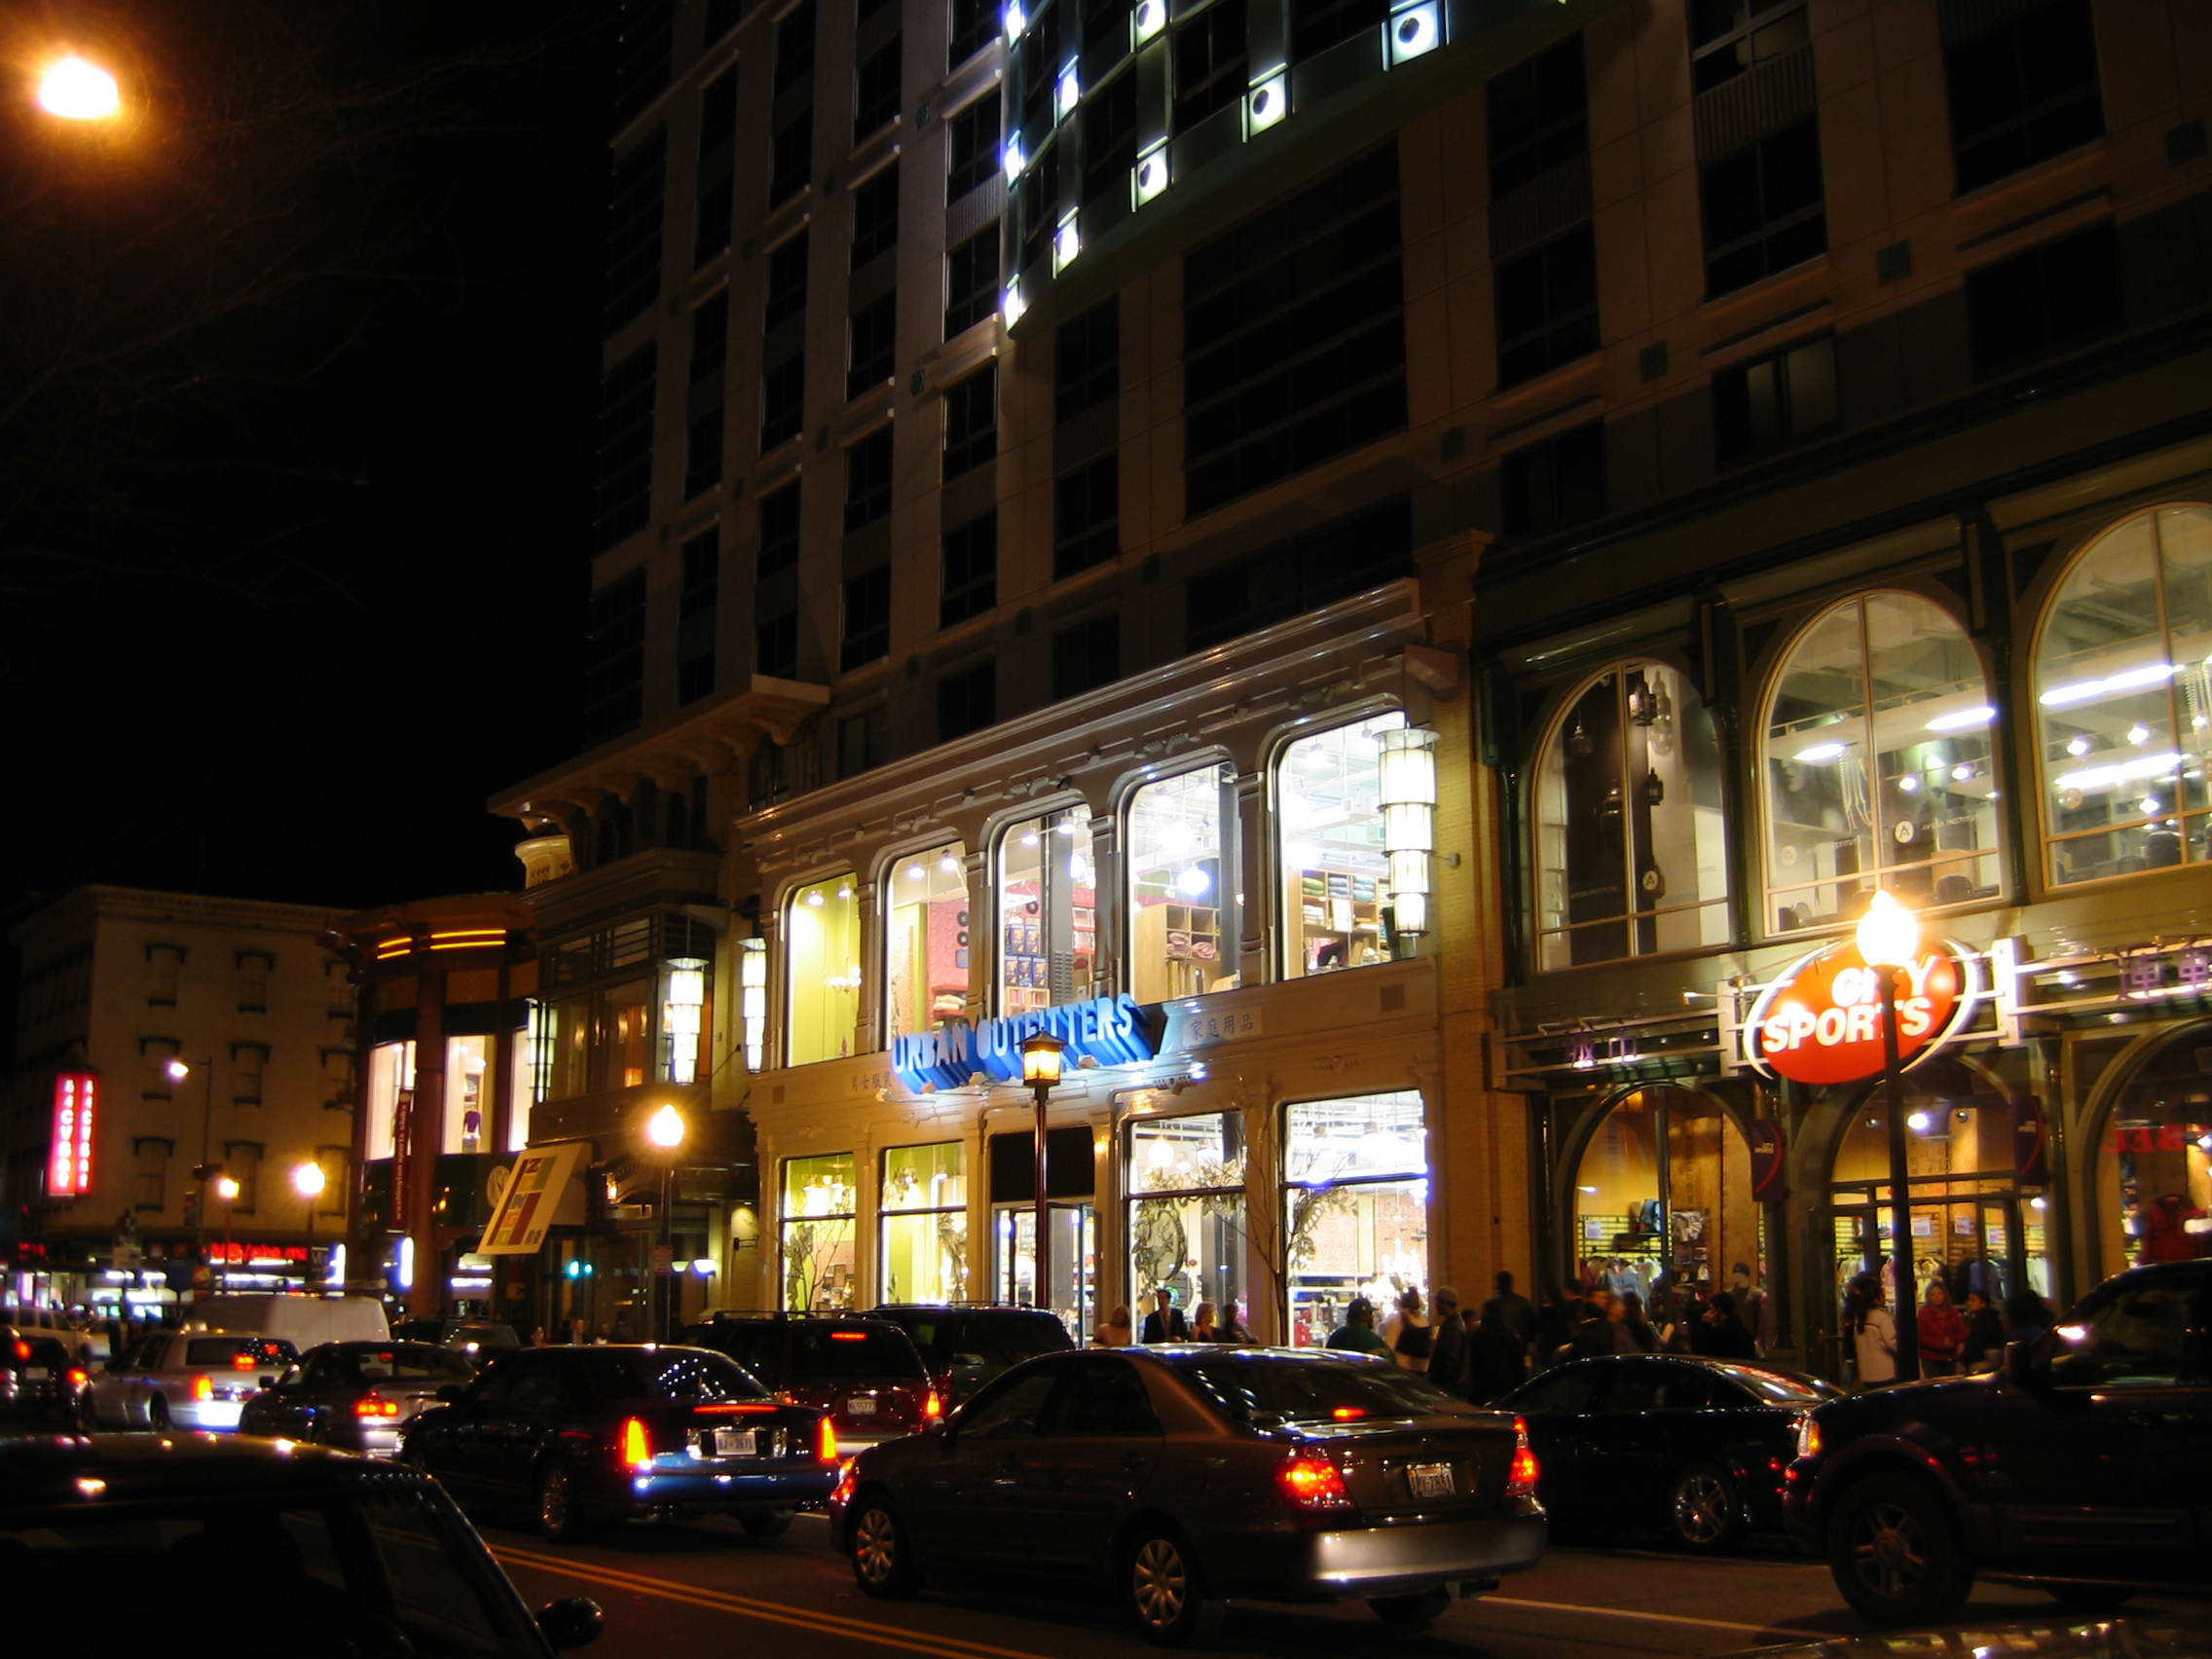 Restaurants Downtown Dc 7th Street